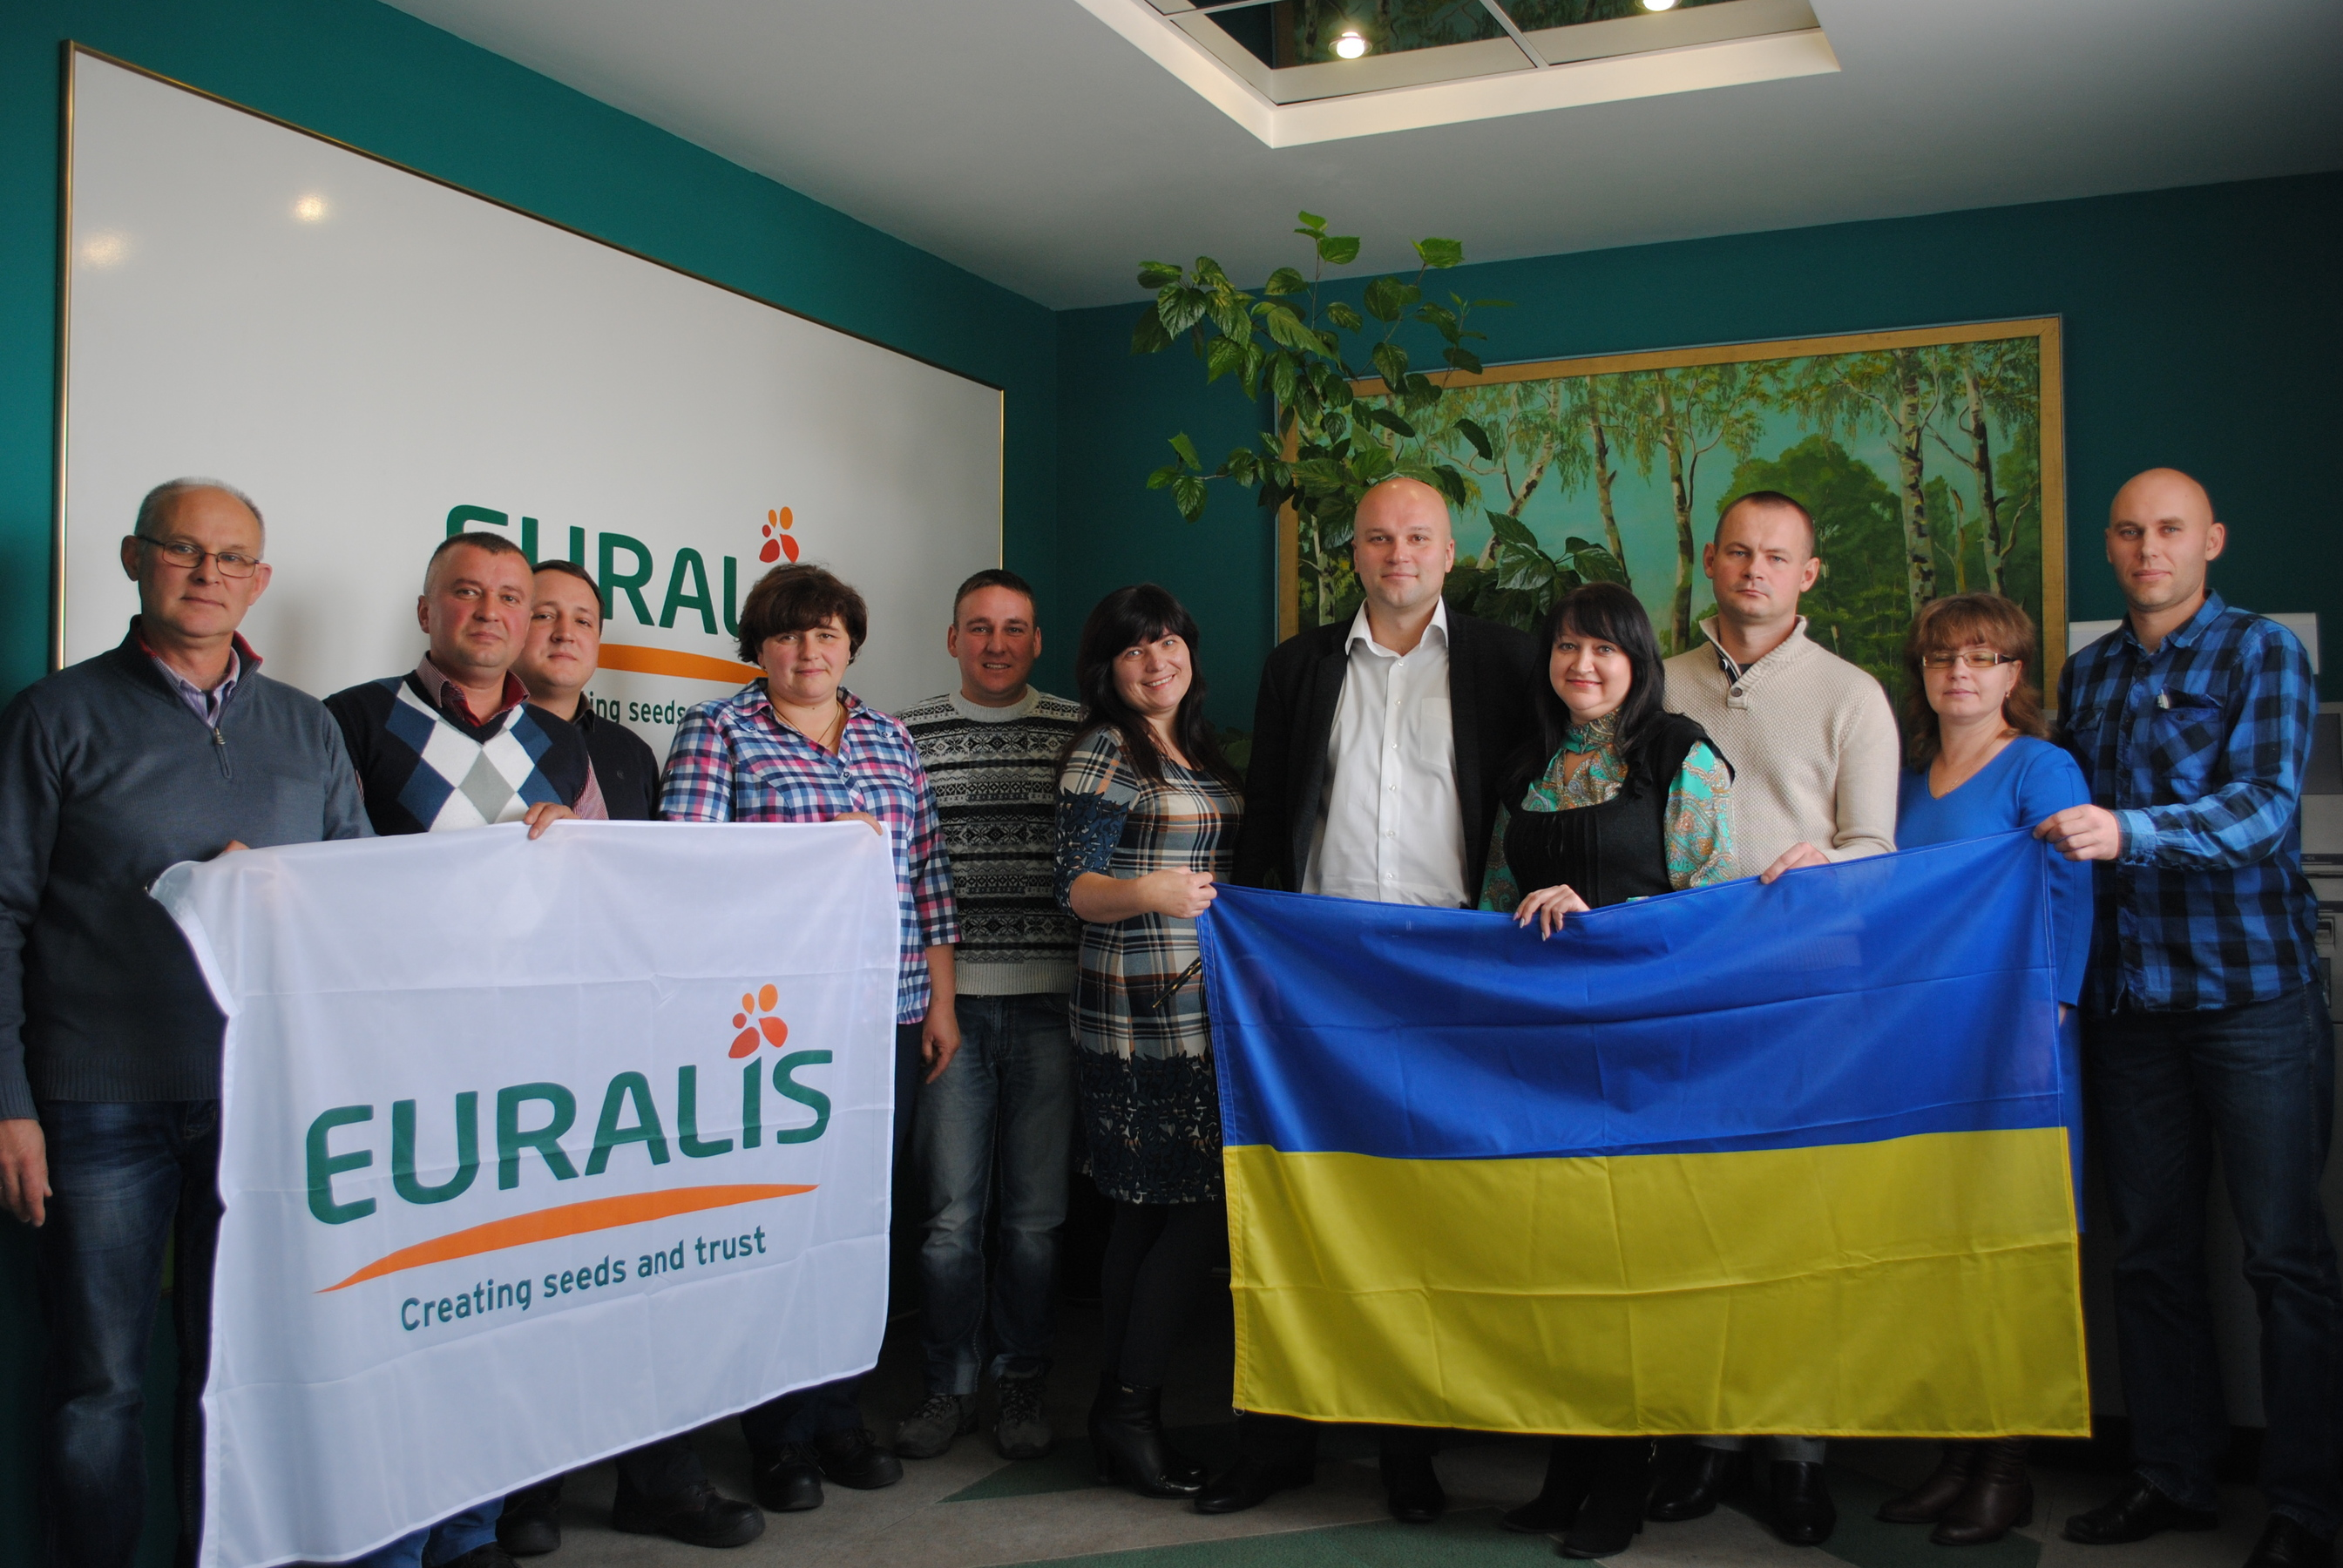 Колектив заводу «Євраліс Семенс Україна»